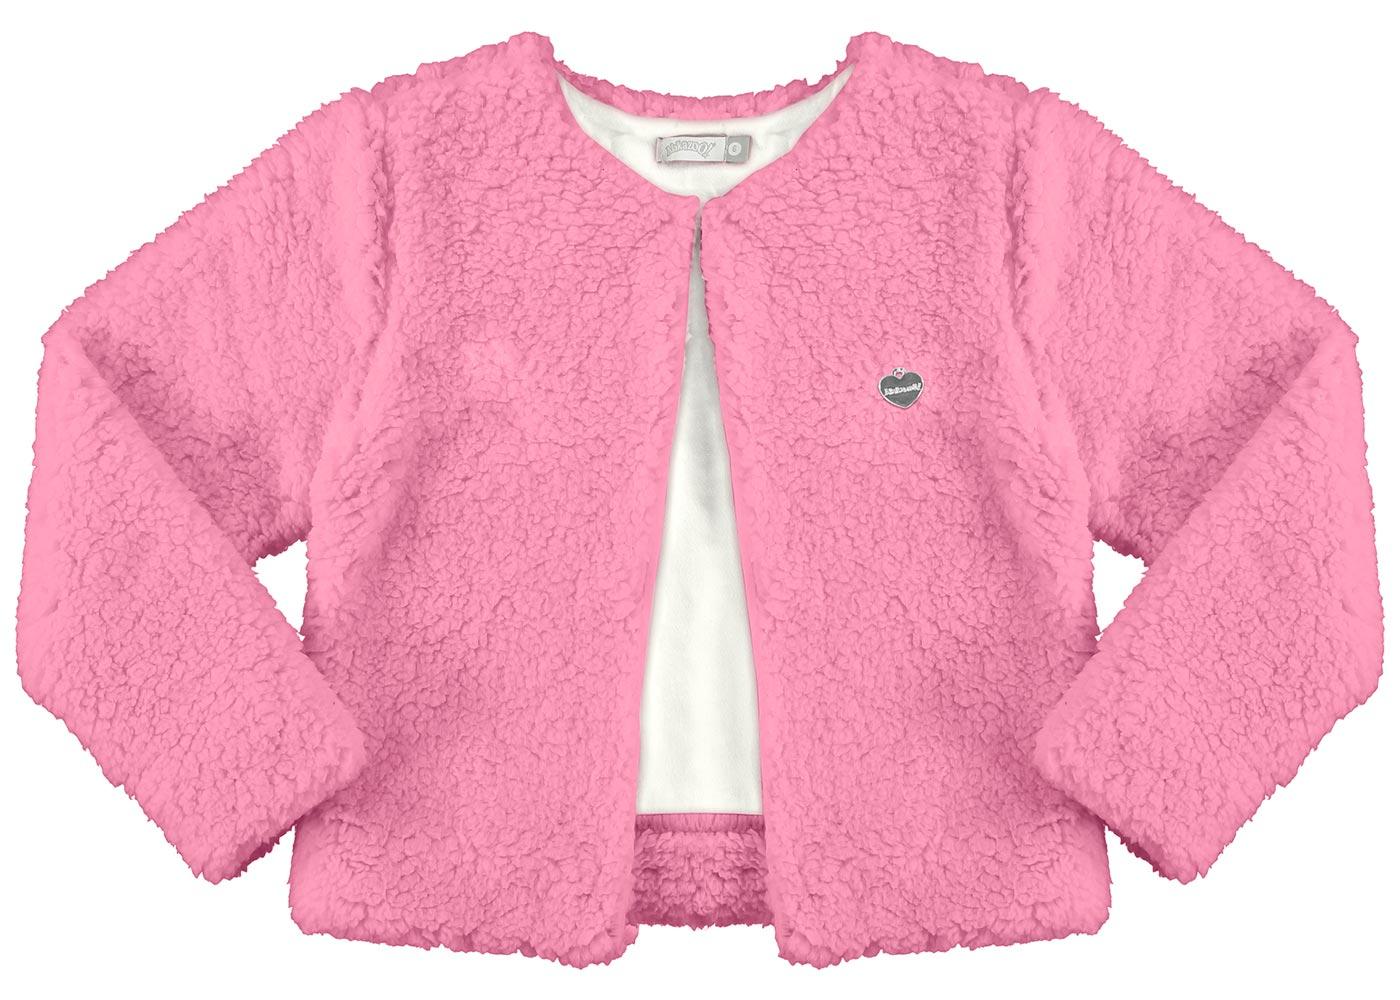 Casaco Infantil Feminino Inverno Rosa Pelo Alakazoo